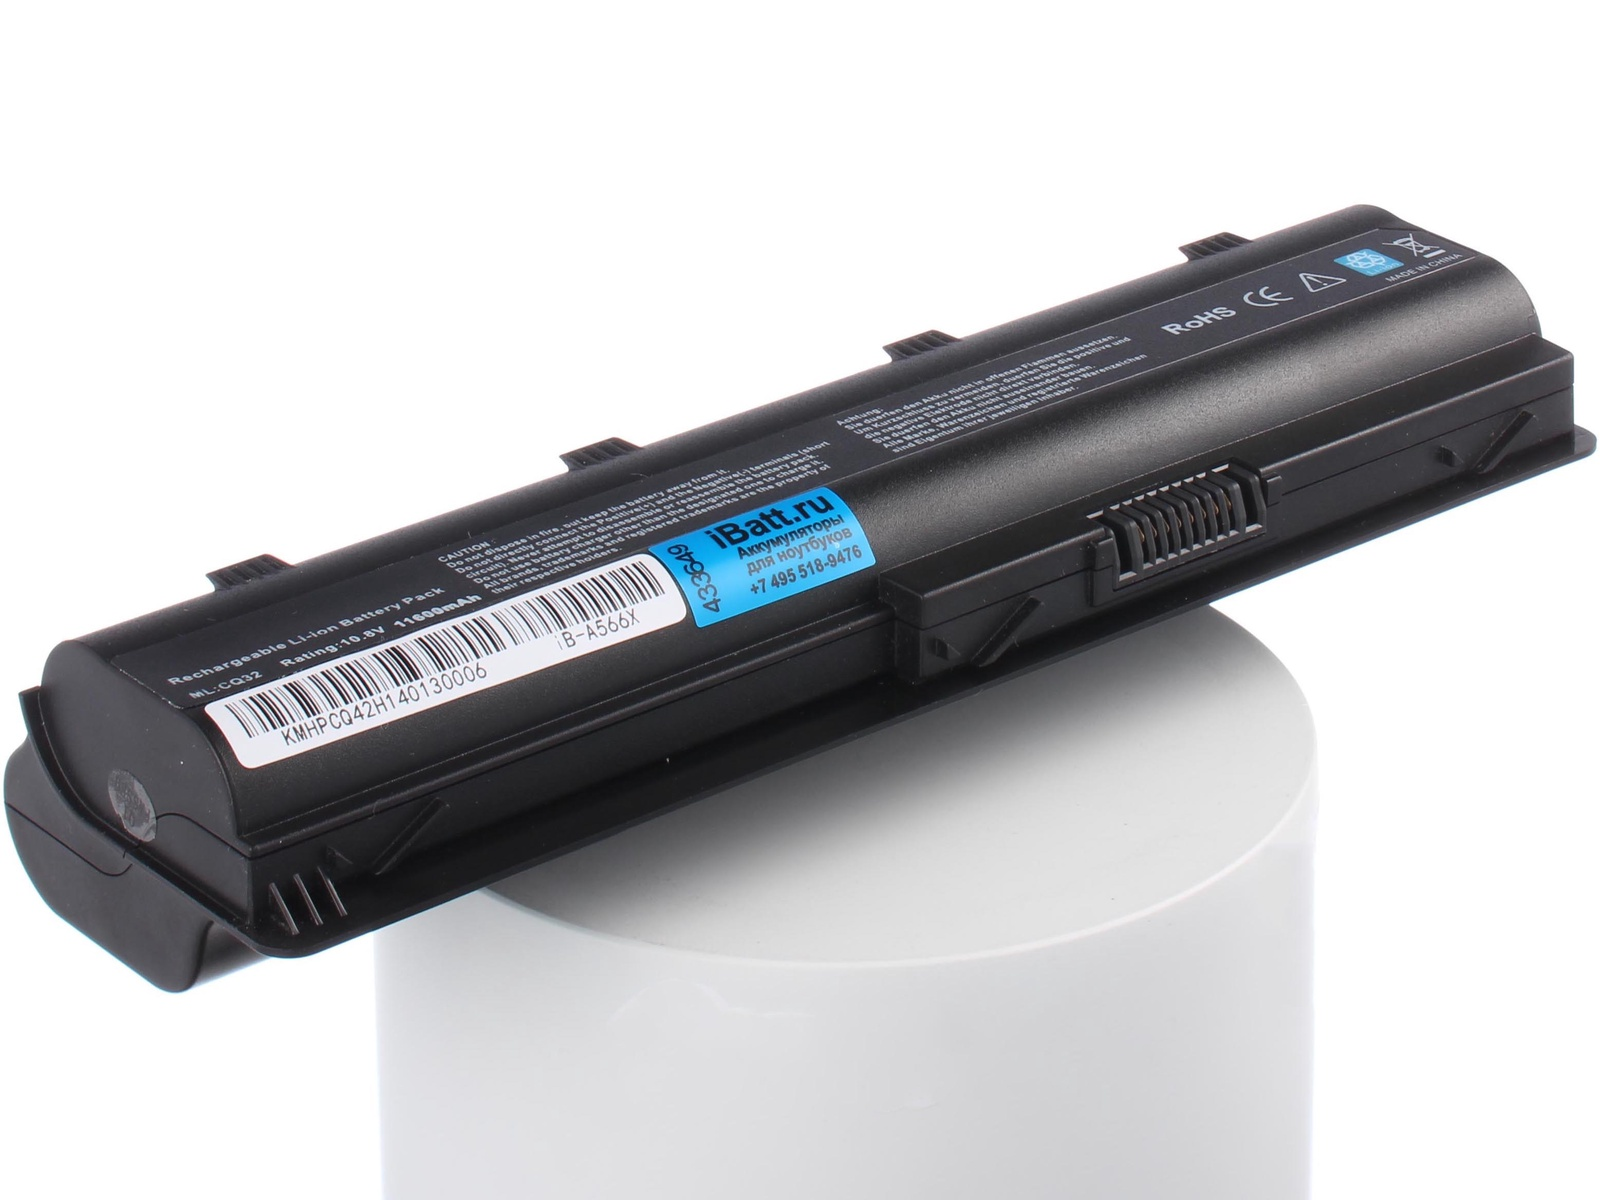 Аккумулятор для ноутбука iBatt для HP-Compaq Pavilion dv6-3152er, Pavilion DV6-3200, Pavilion dv6-3327sr, Pavilion dv6-6029sr, Pavilion dv6-6c04sr, Pavilion dv6-6c65sx, Pavilion dv7-4011el, Pavilion dv7-4105sg